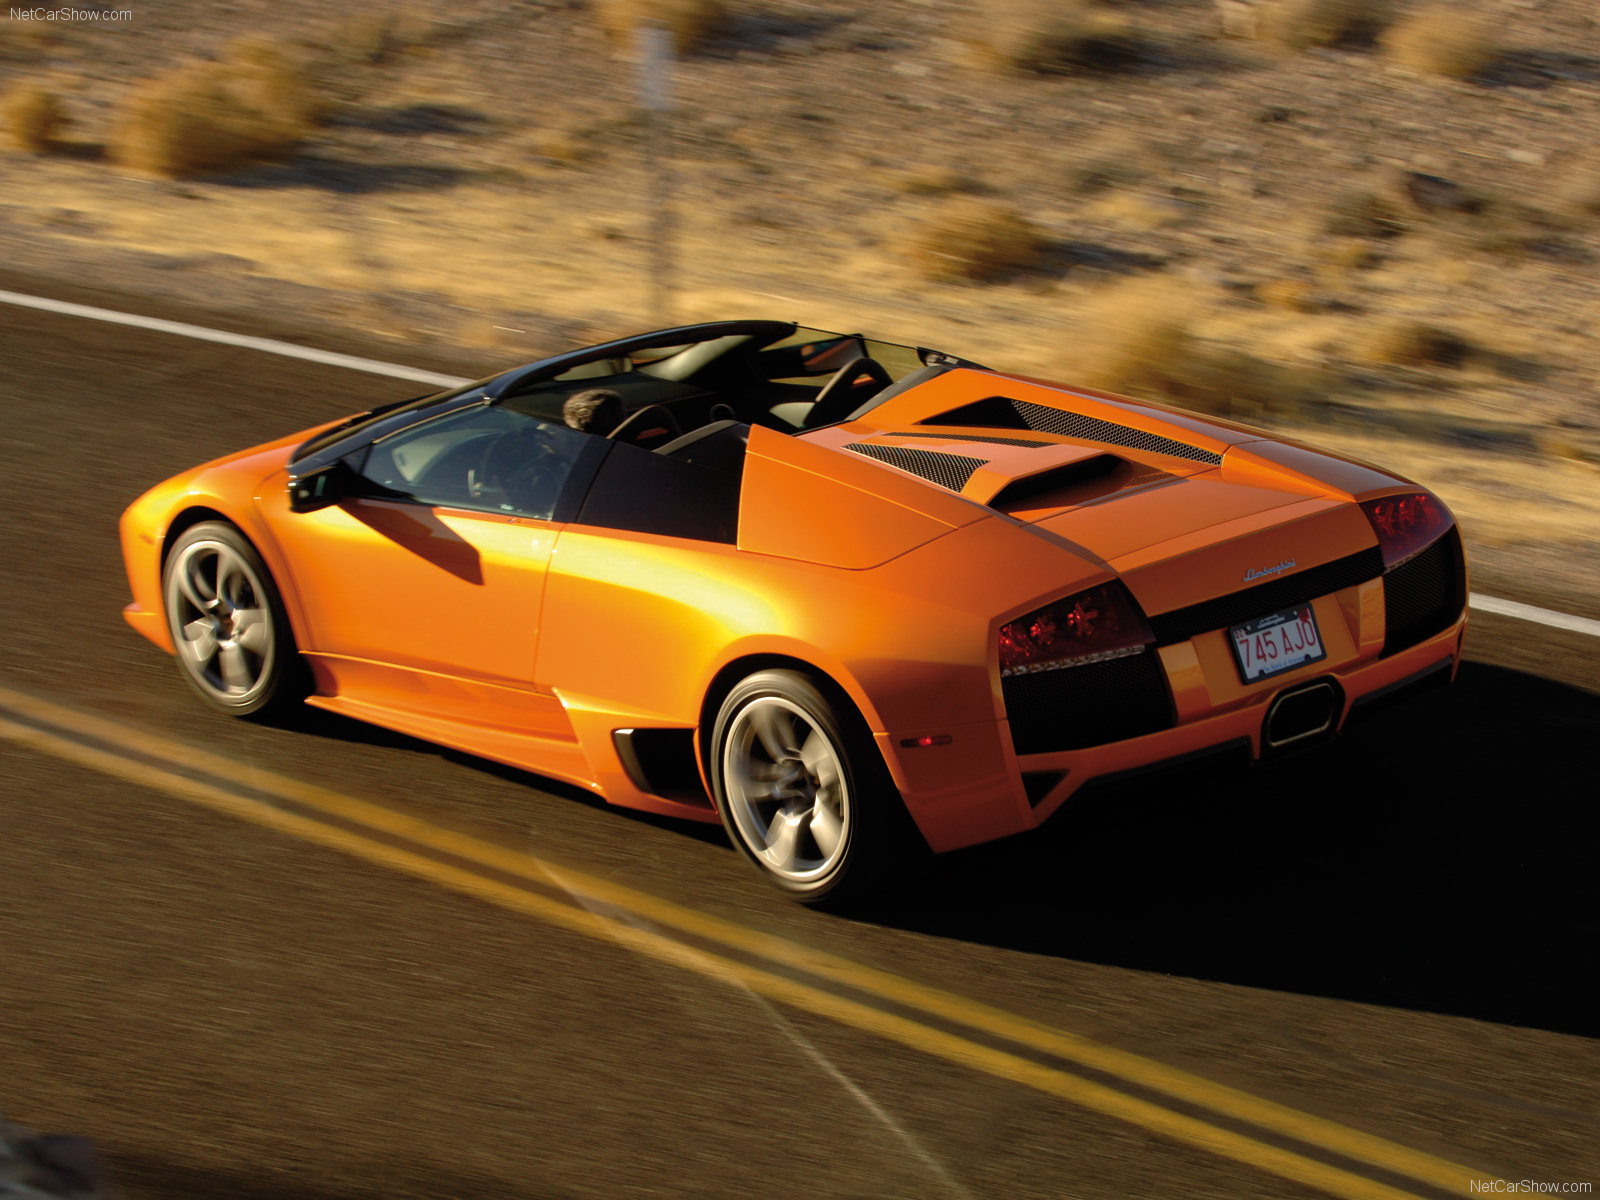 Lamborghini Murcielago Lp640 Photos Photogallery With 36